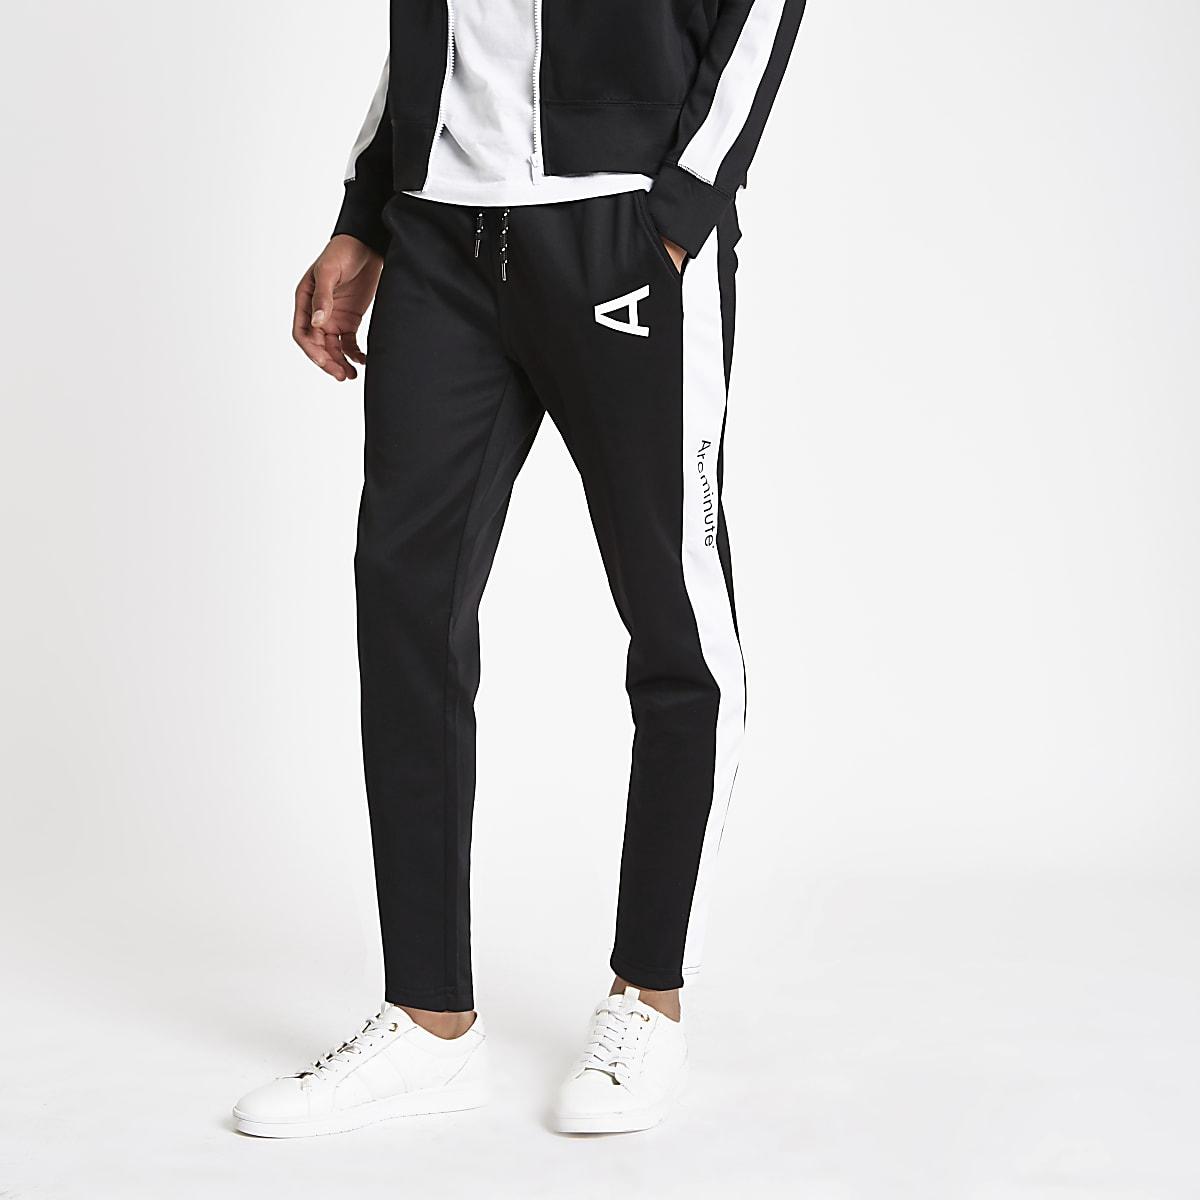 Arcminute black logo joggers